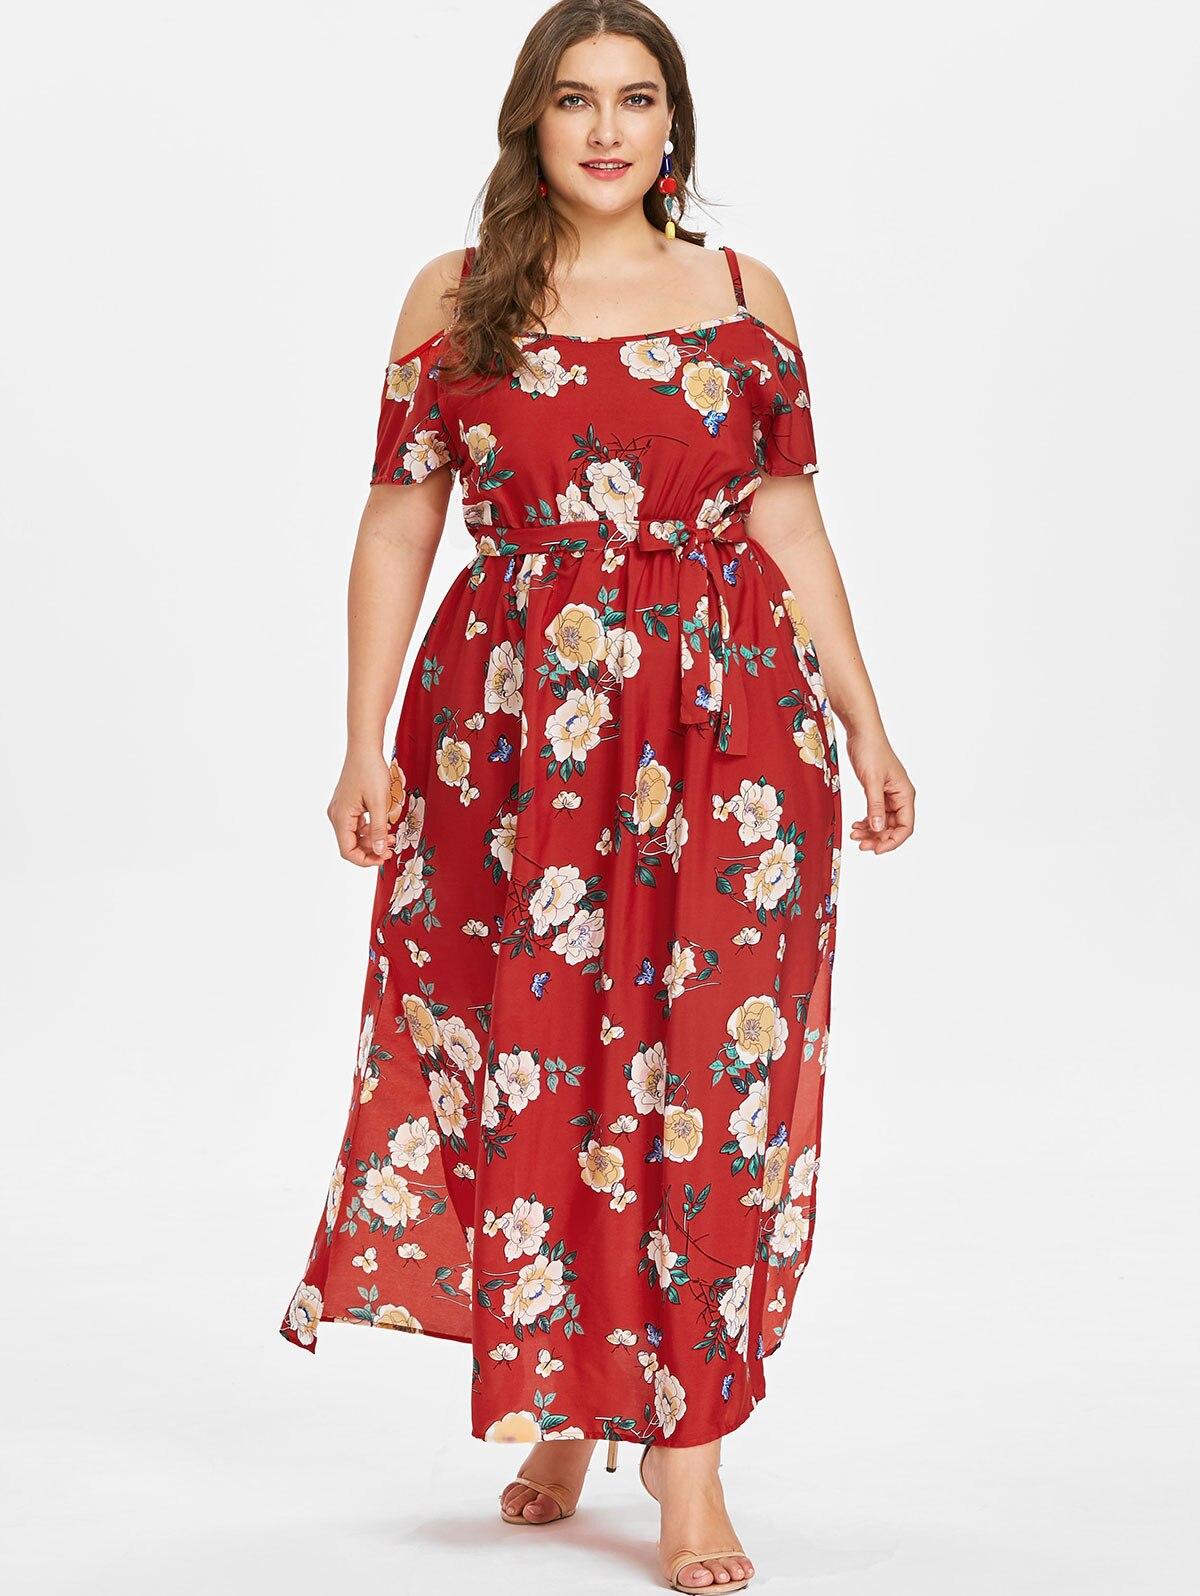 Dresses Length  Floor-Length Neckline  Spaghetti Strap Sleeve Type  Cold  Shoulder Sleeve Length  Short Sleeves Waist  Empire Embellishment  Slit 7c2f0885c1d2